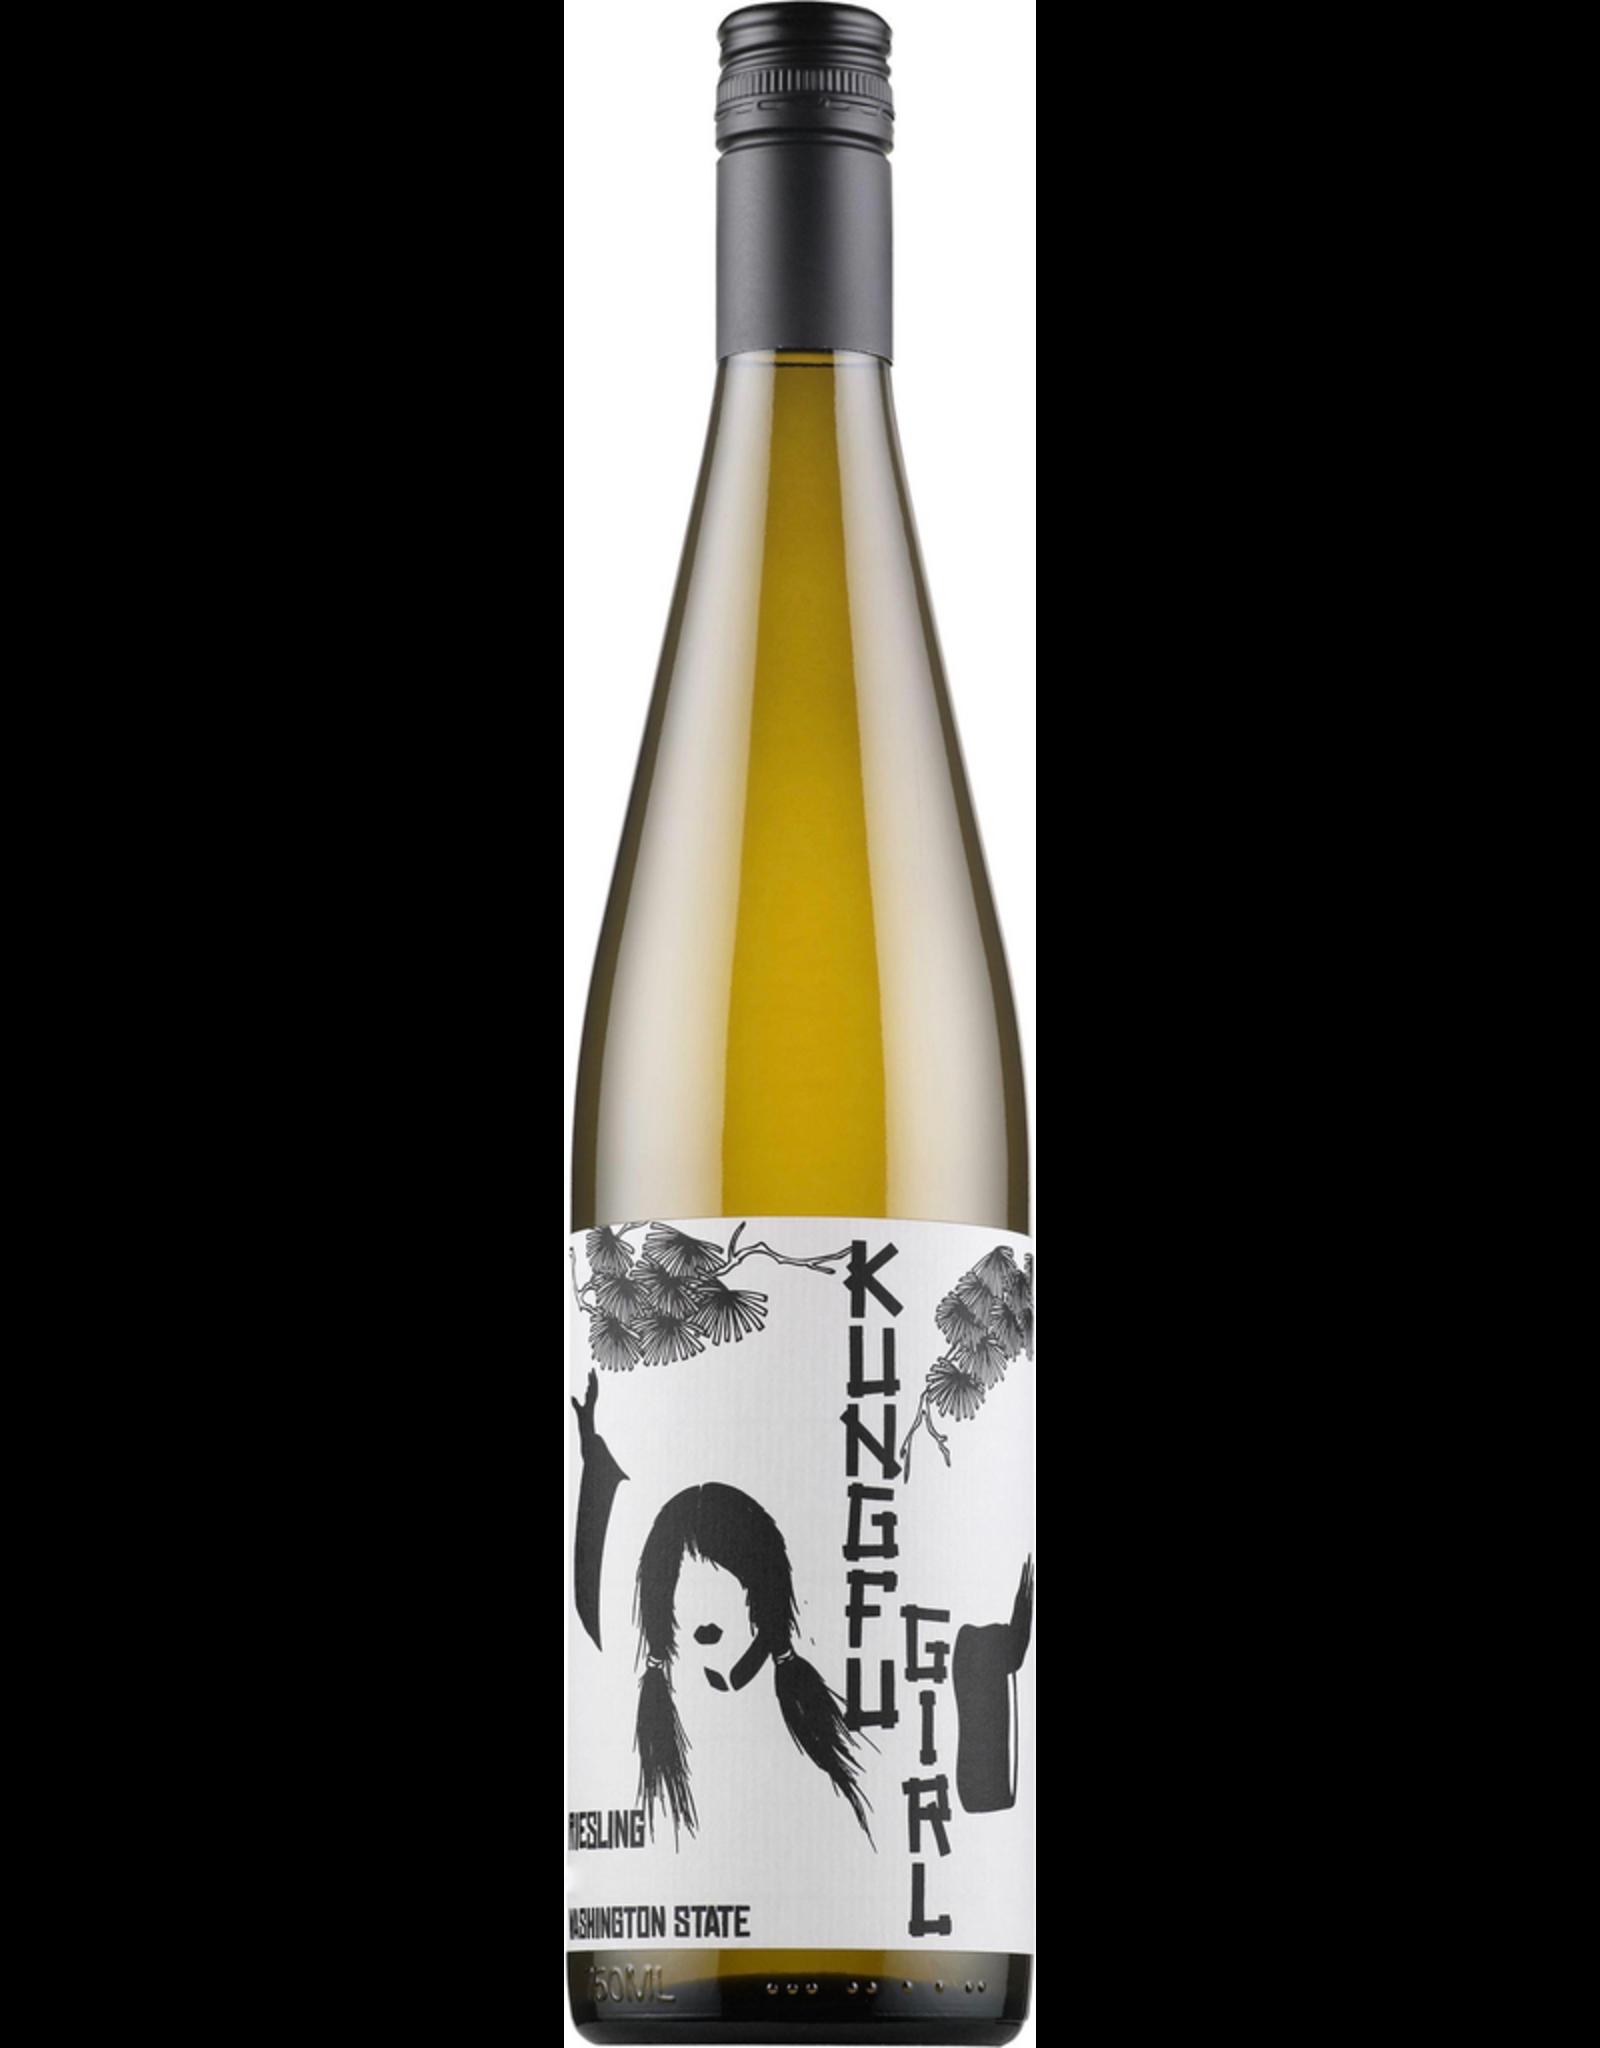 White Wine 2016, Charles Smith Kung Fu Girl, Riesling, Multi-regional Blend, Mattawa, Washington, USA, 12% Alc, CTnr WS89, TW89